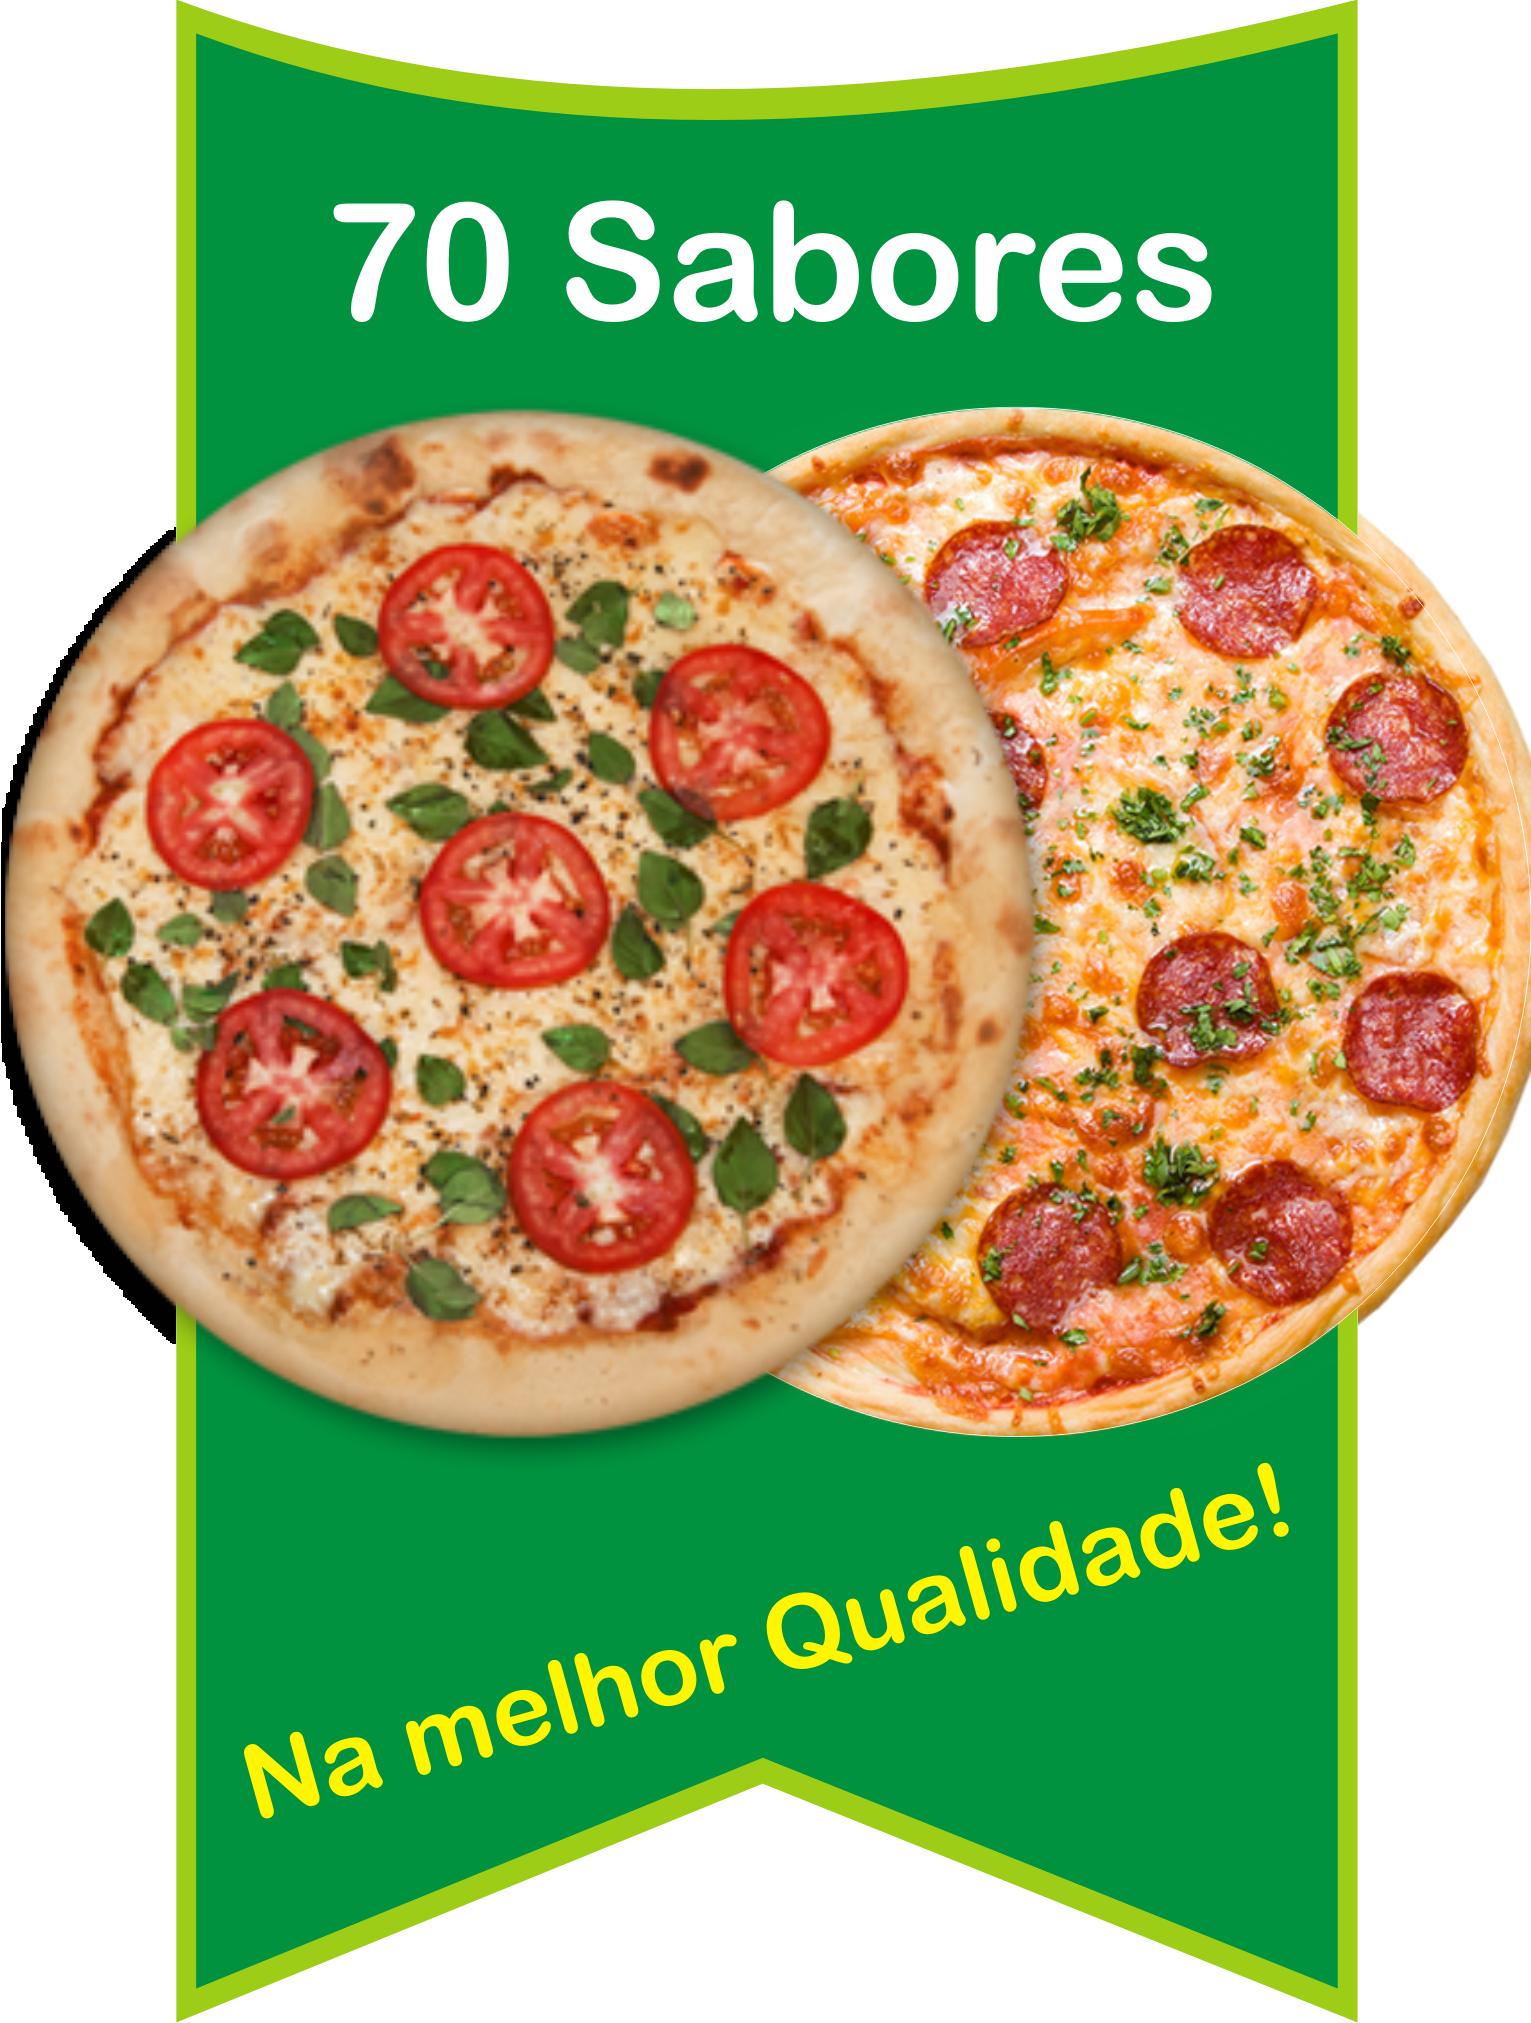 sabores_pizzas 1